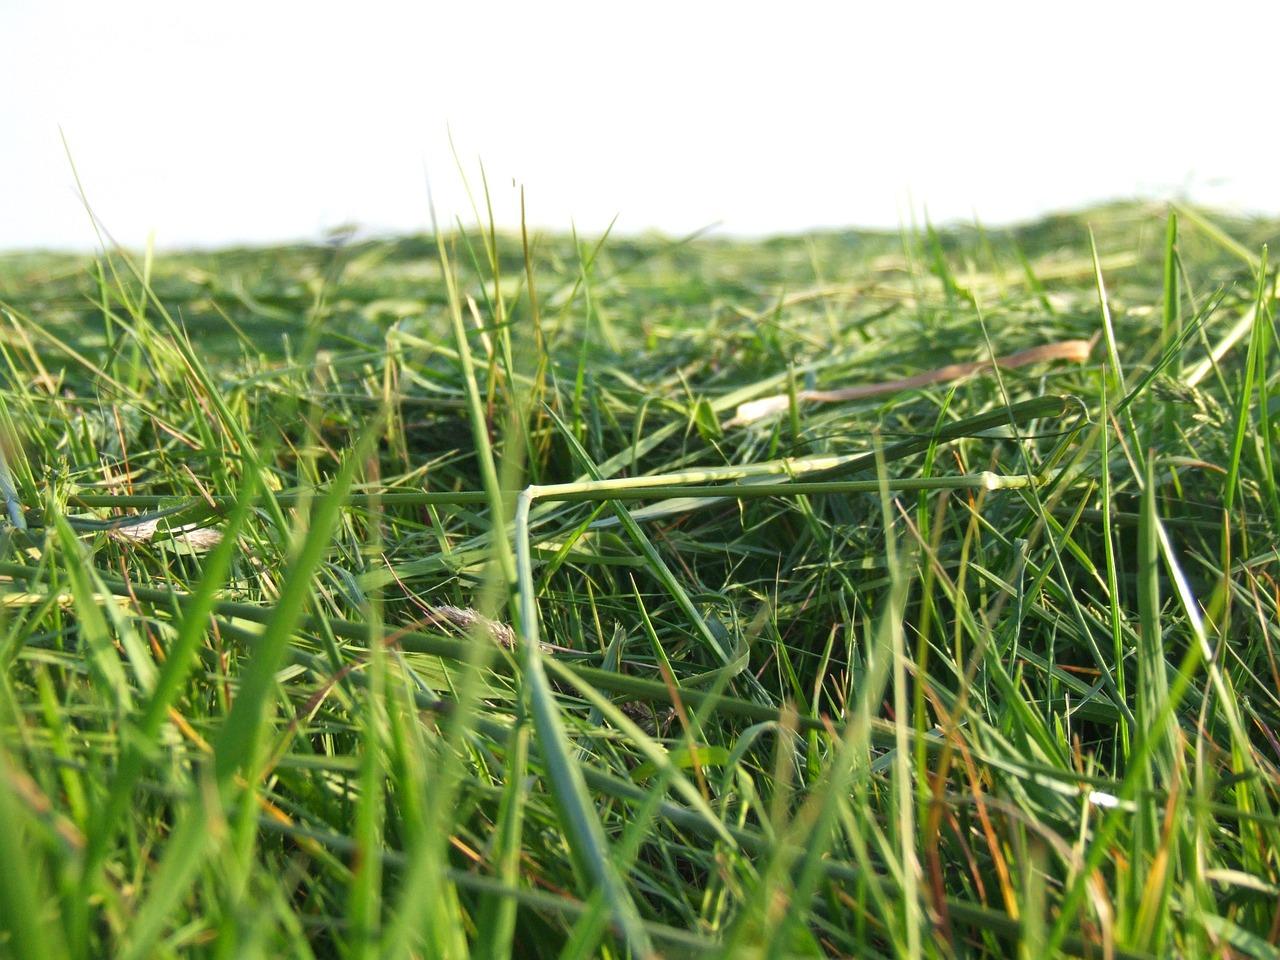 трава скошена картинка гироскопического типа